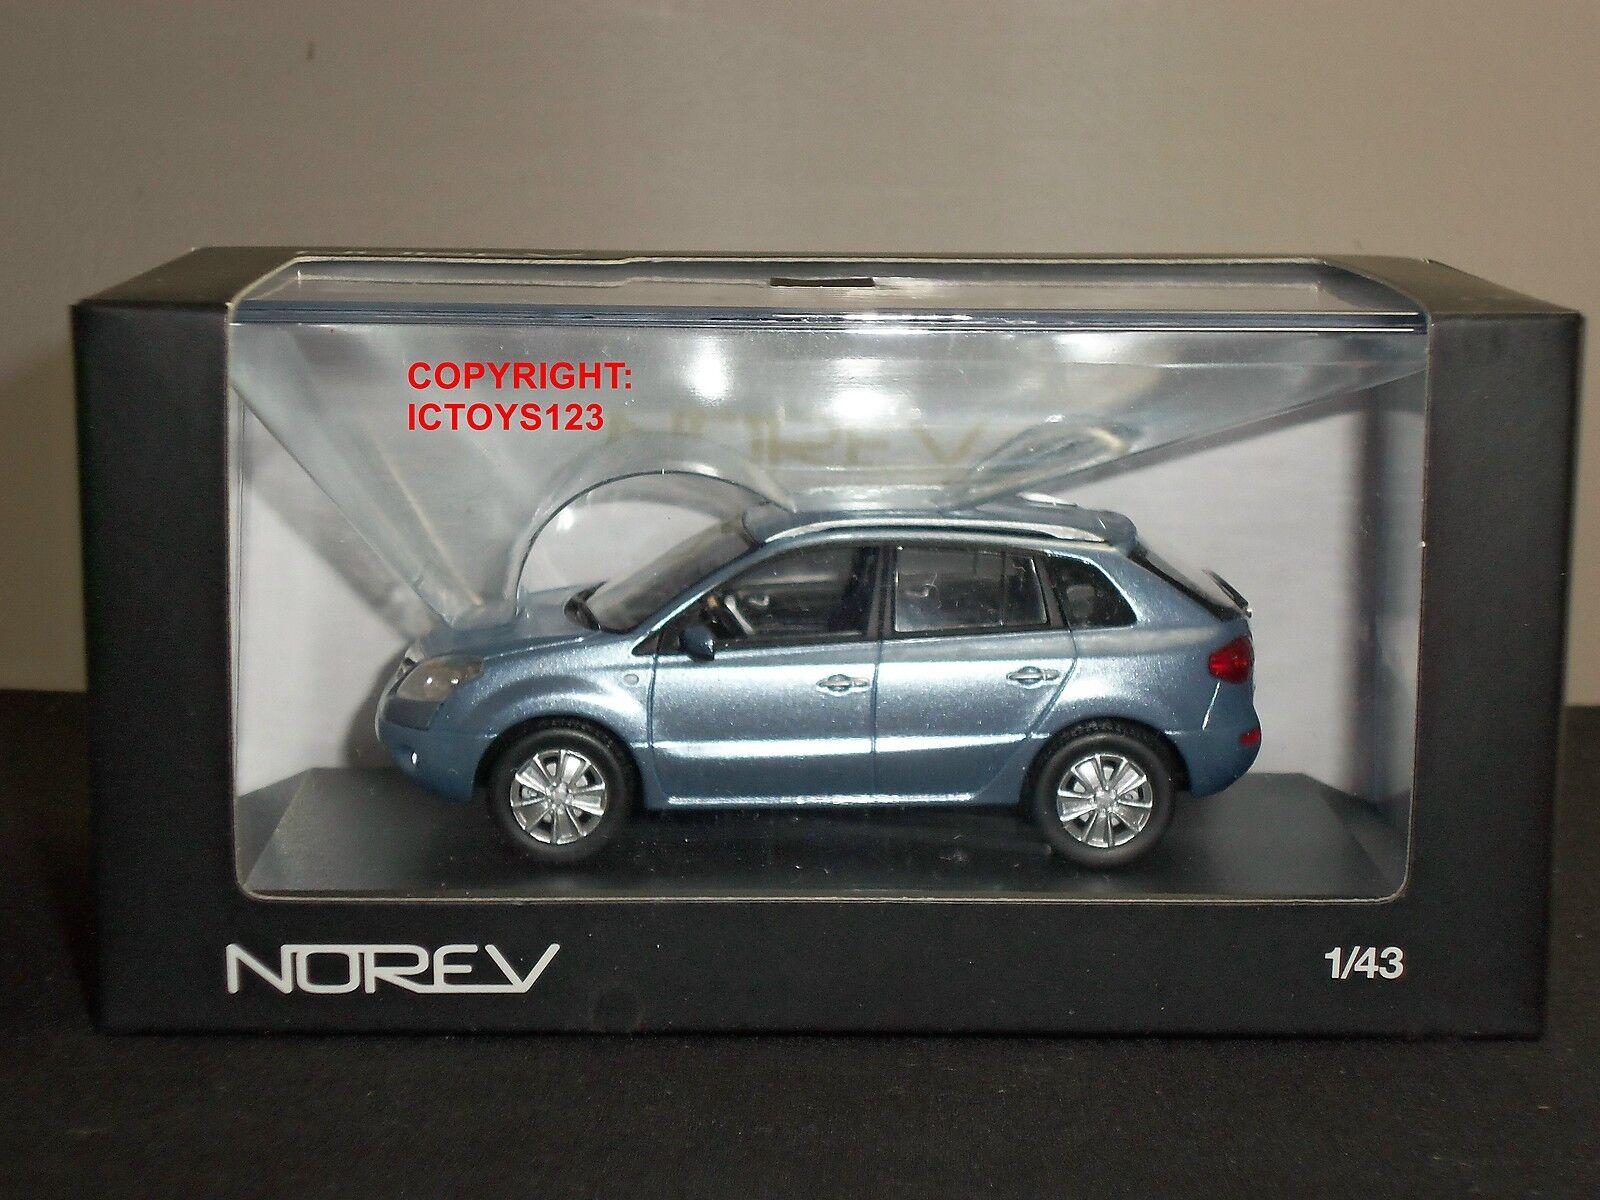 Norev 800953 Coche Modelo Diecast Samsung QM5 blu